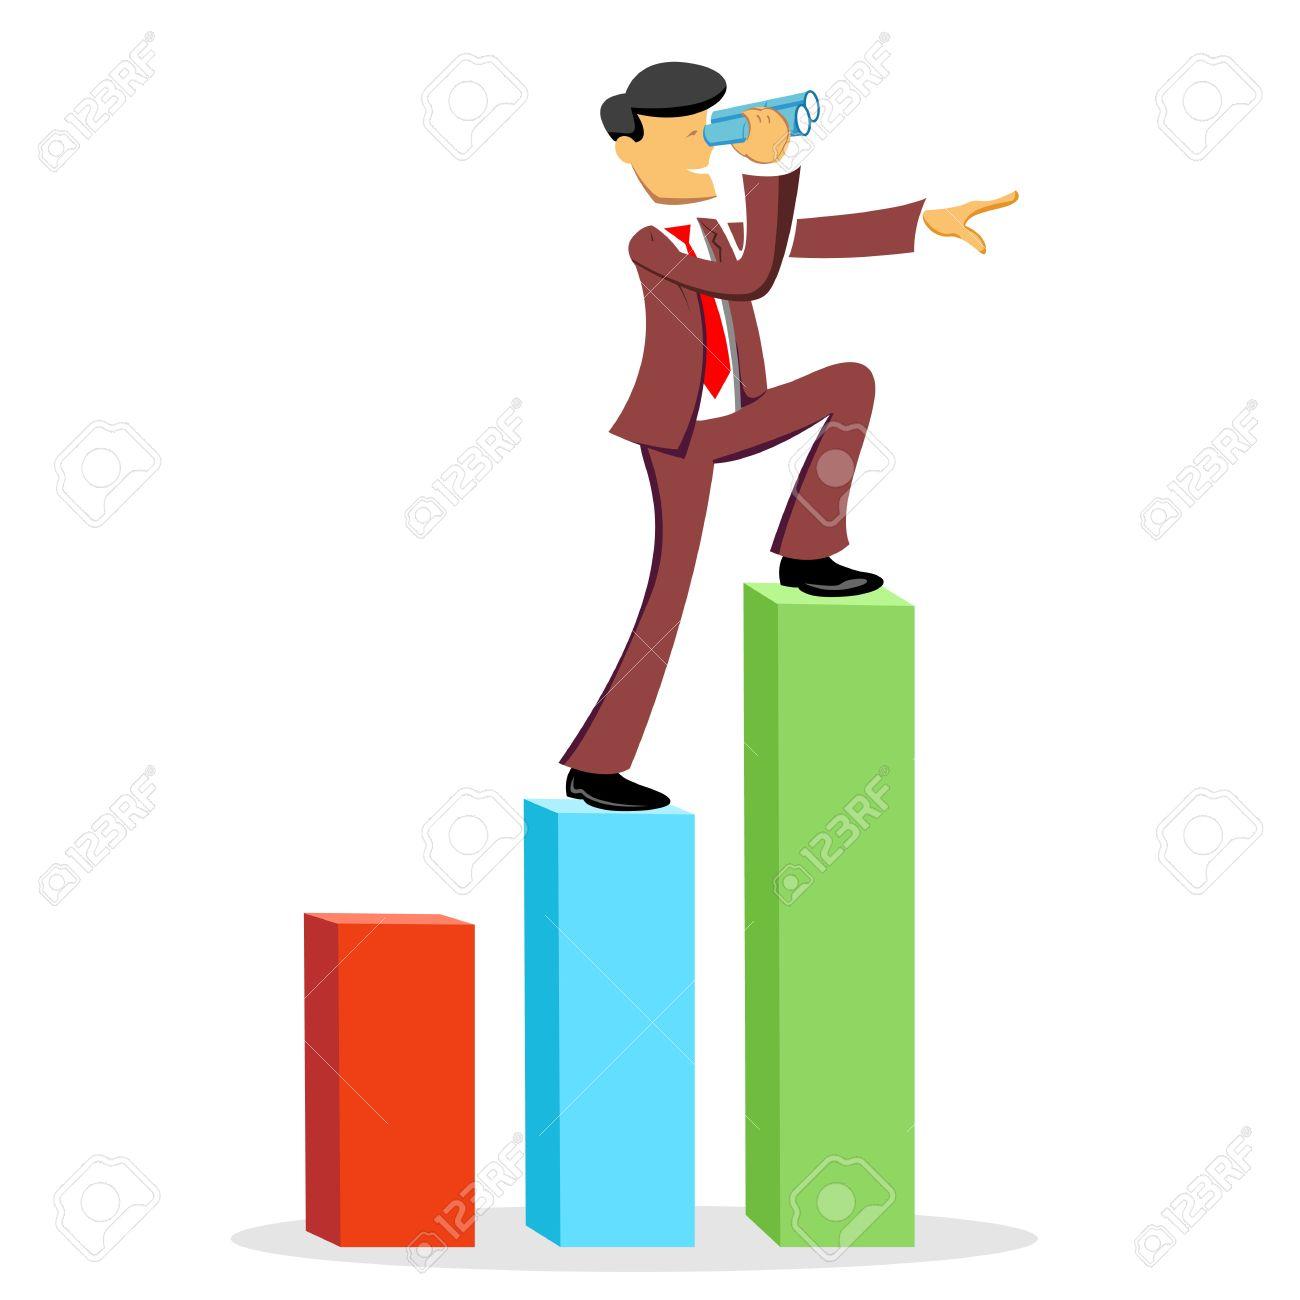 Analyst clipart: financial analyst: